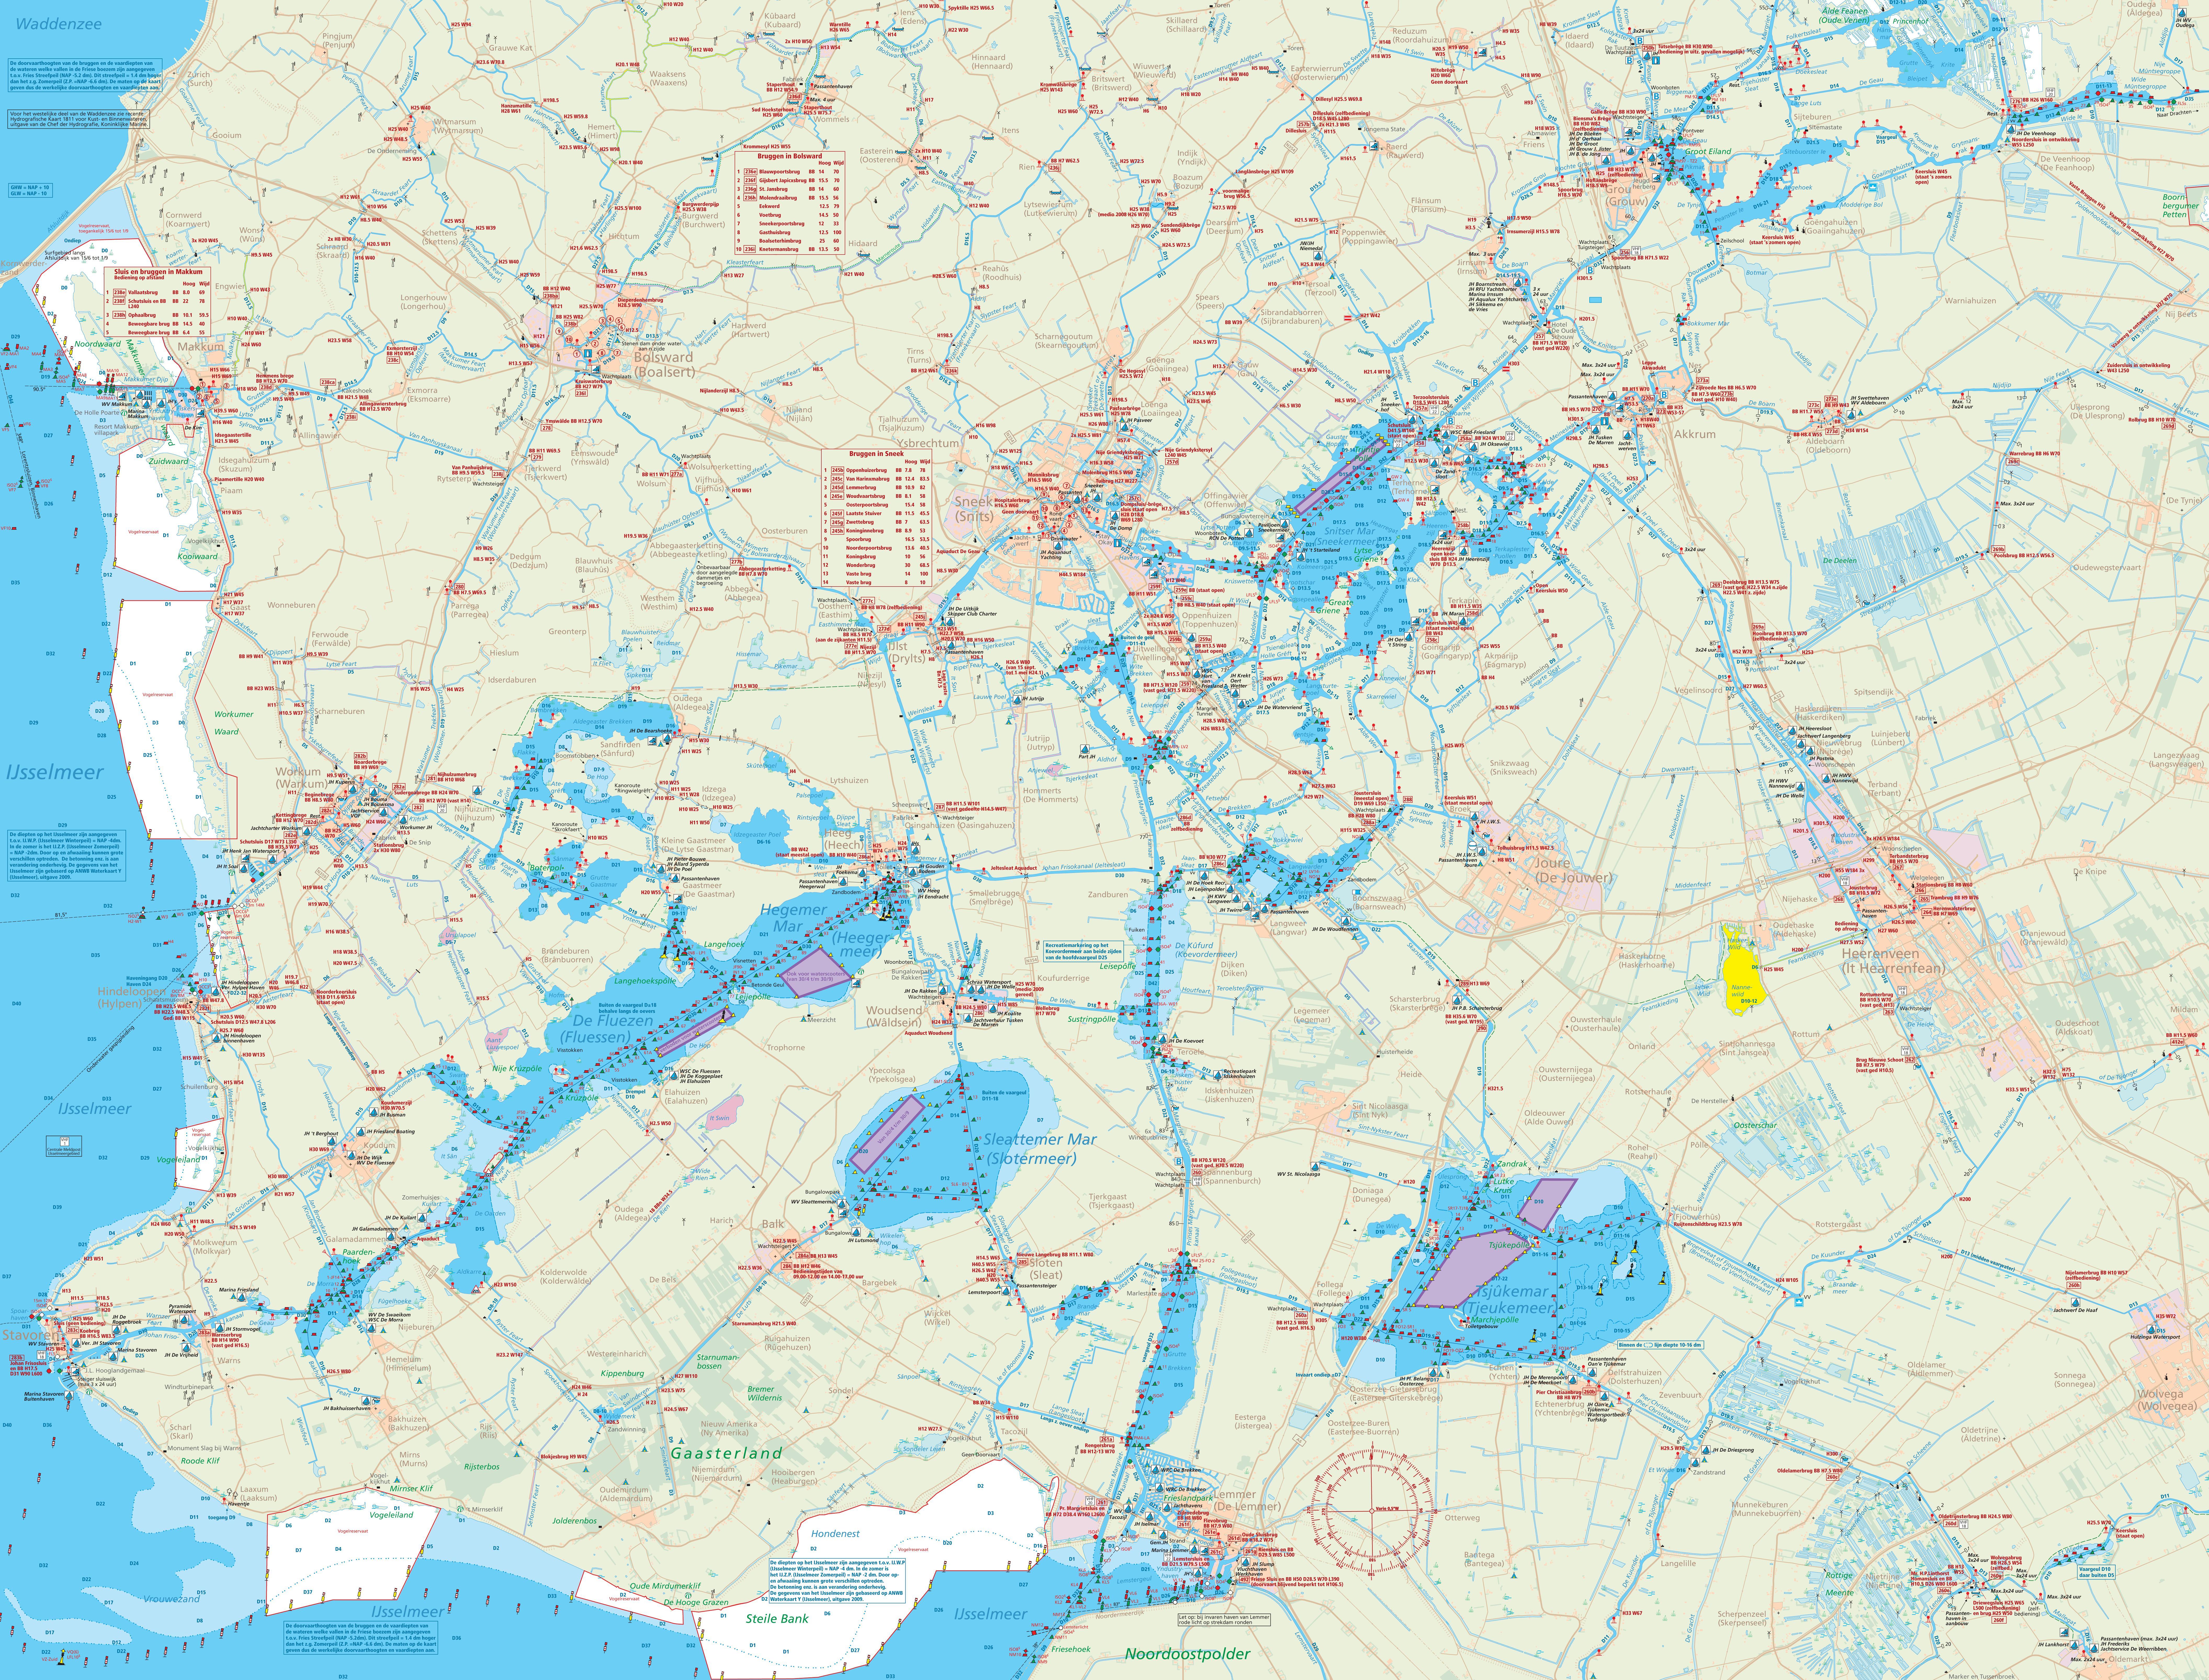 NCBootverhuur Waterkaarten | ncbootverhuur.nl